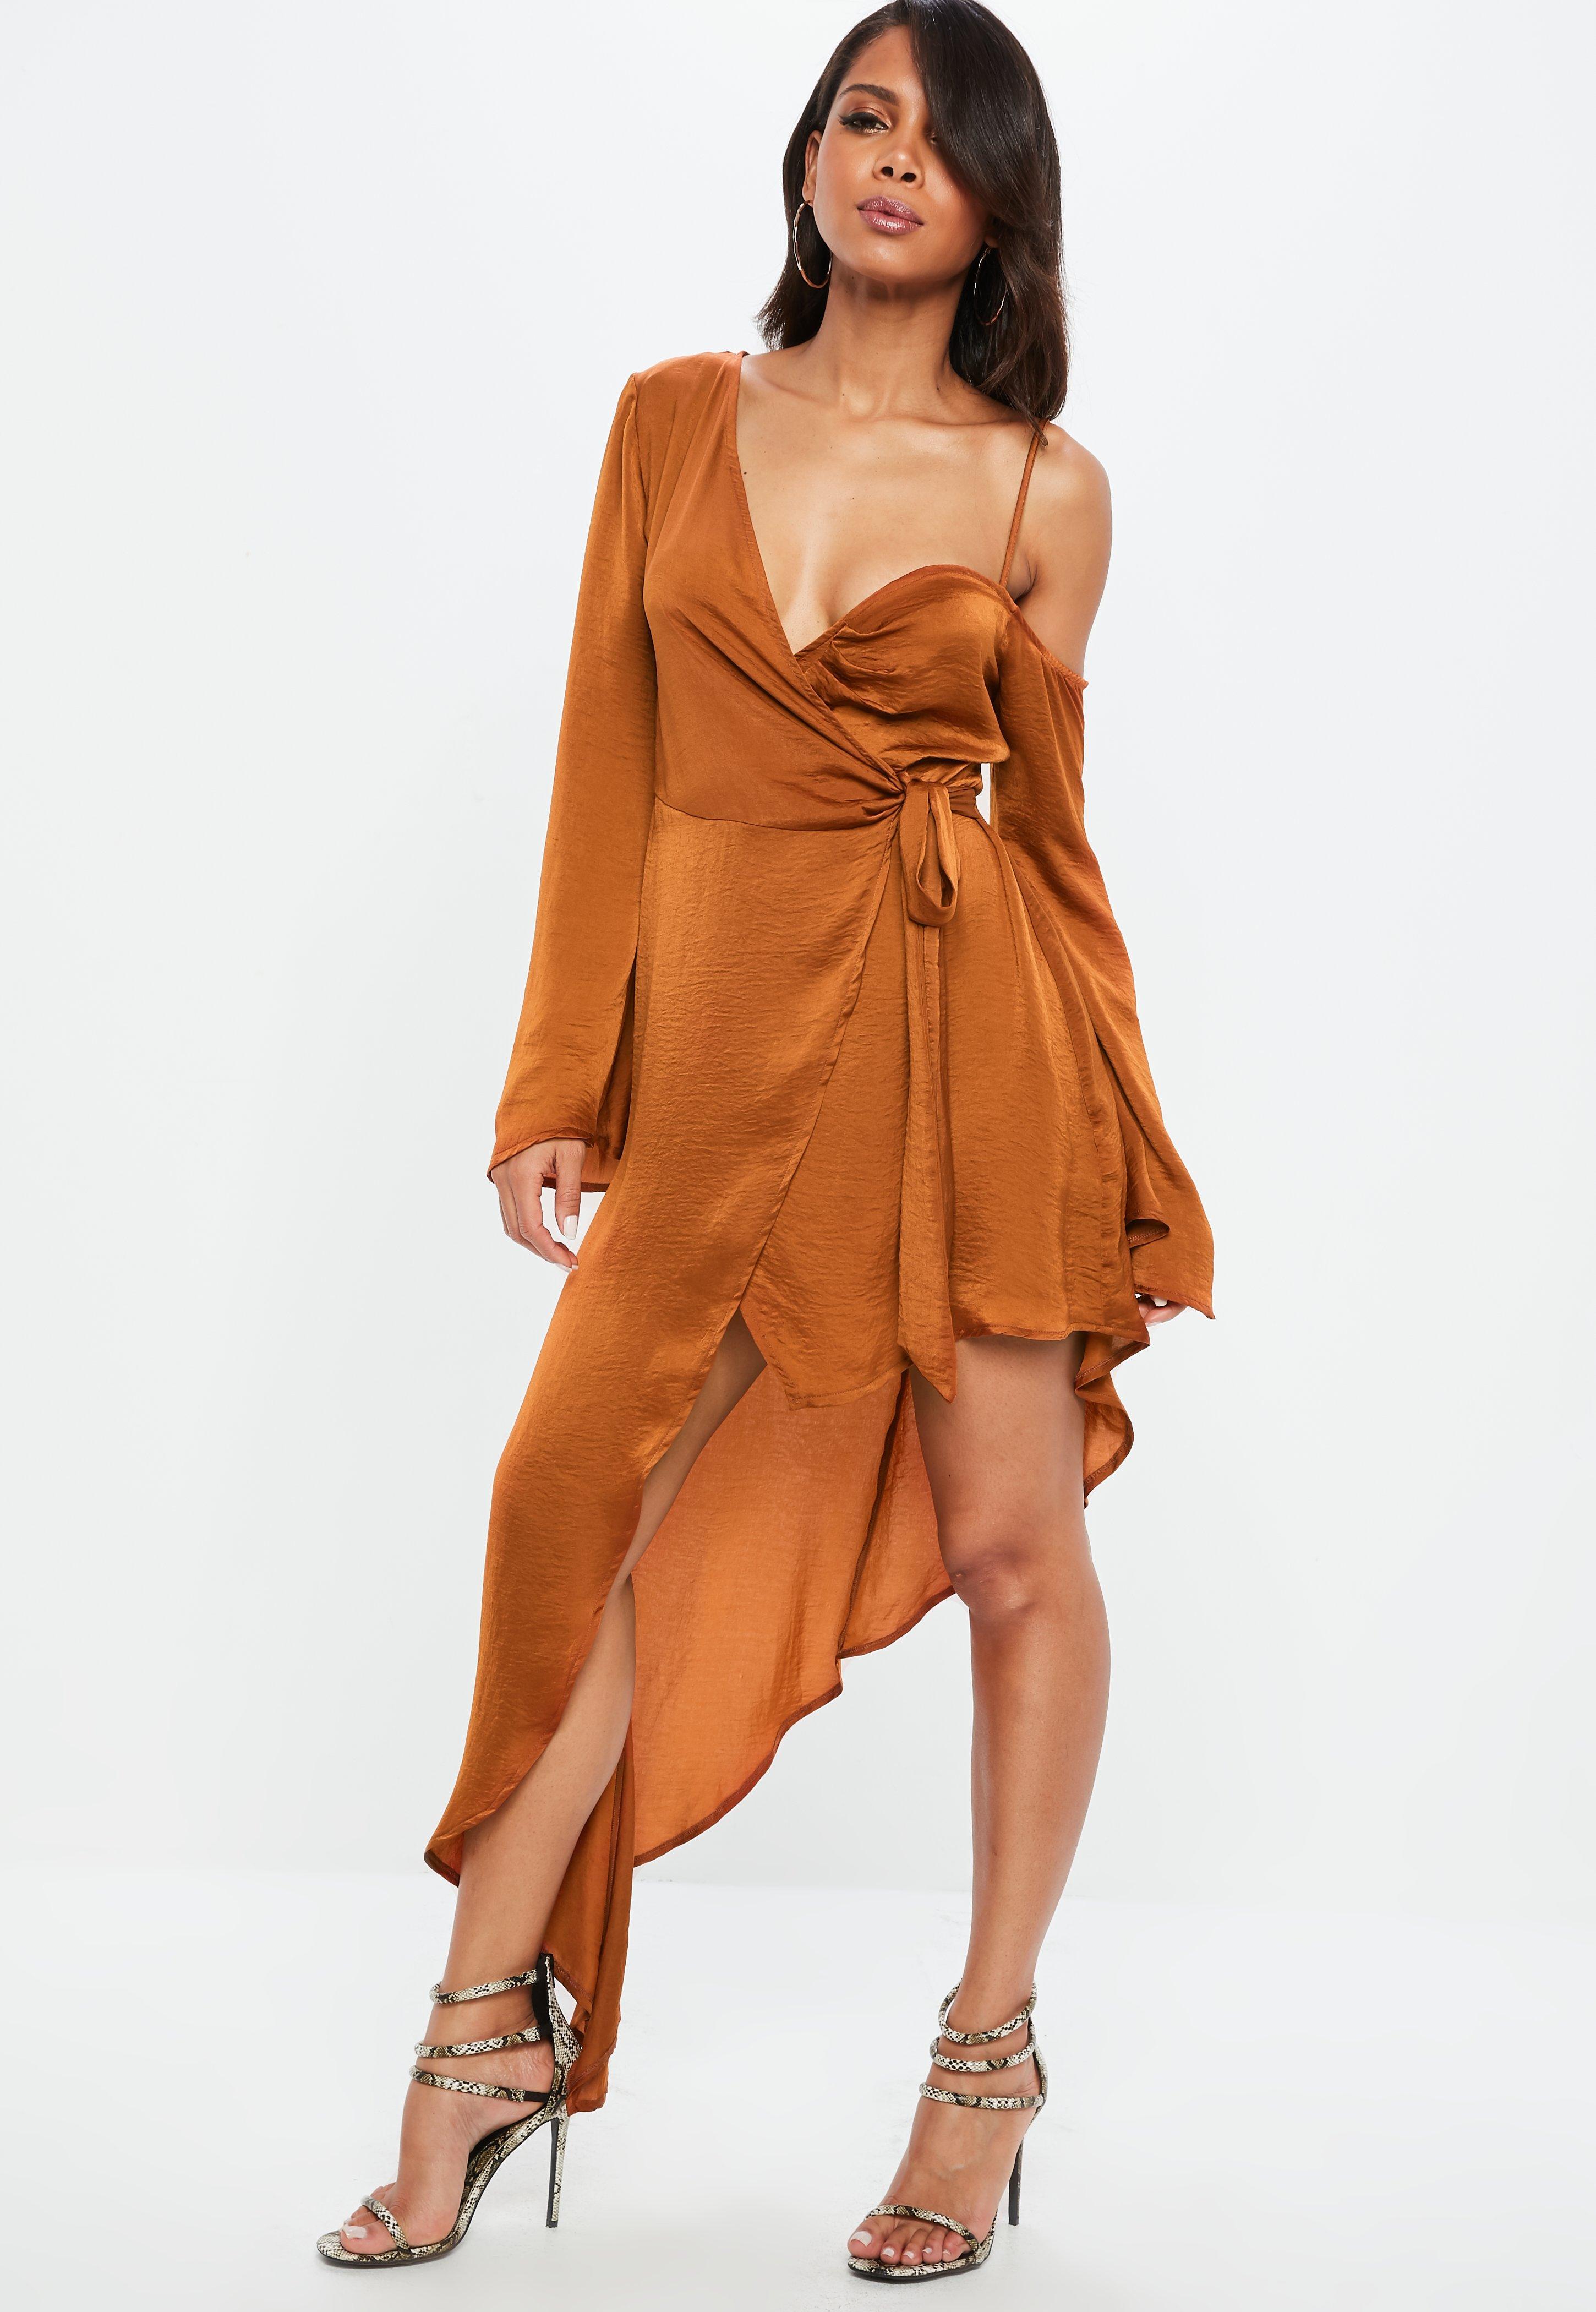 Orange Dresses | Burnt Orange Dresses - Missguided Australia